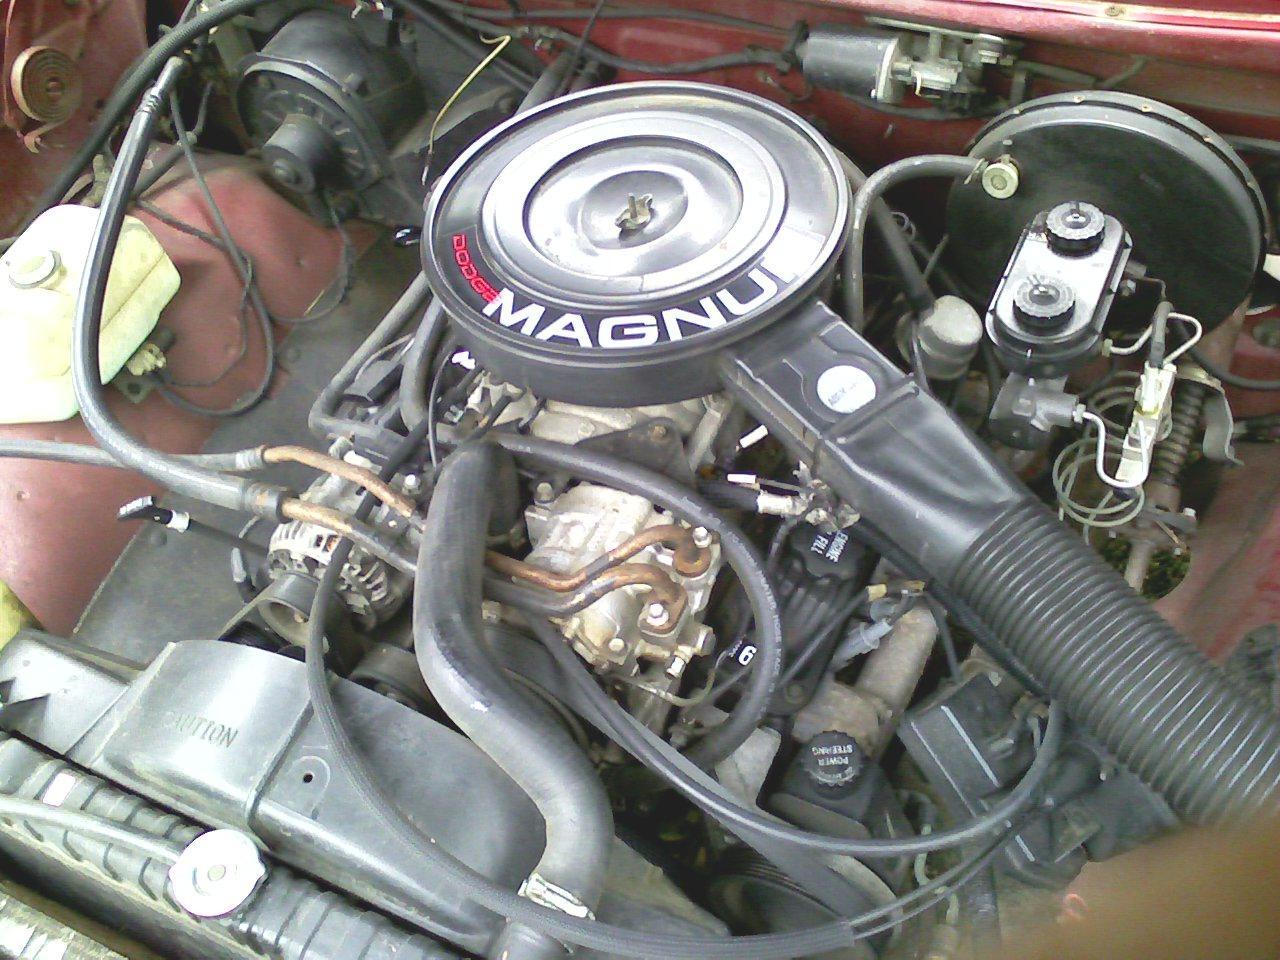 1993 Dodge W150 Wiring Diagram Dodge Ram 150 Questions 92 Dodge Cargurus